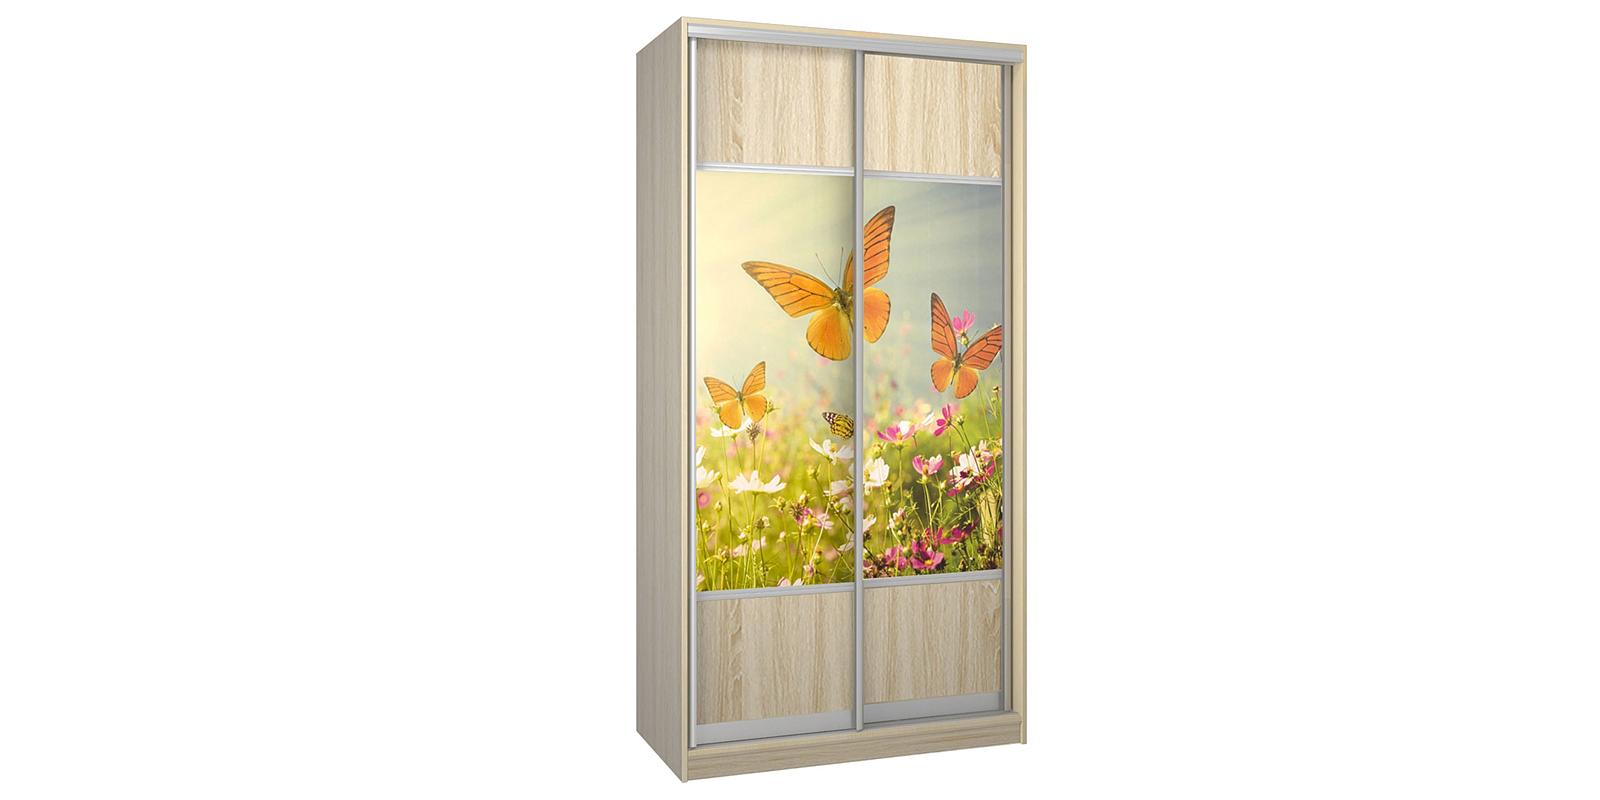 Шкаф-купе двухдверный Бостон 110 см (дуб сонома/бабочки)